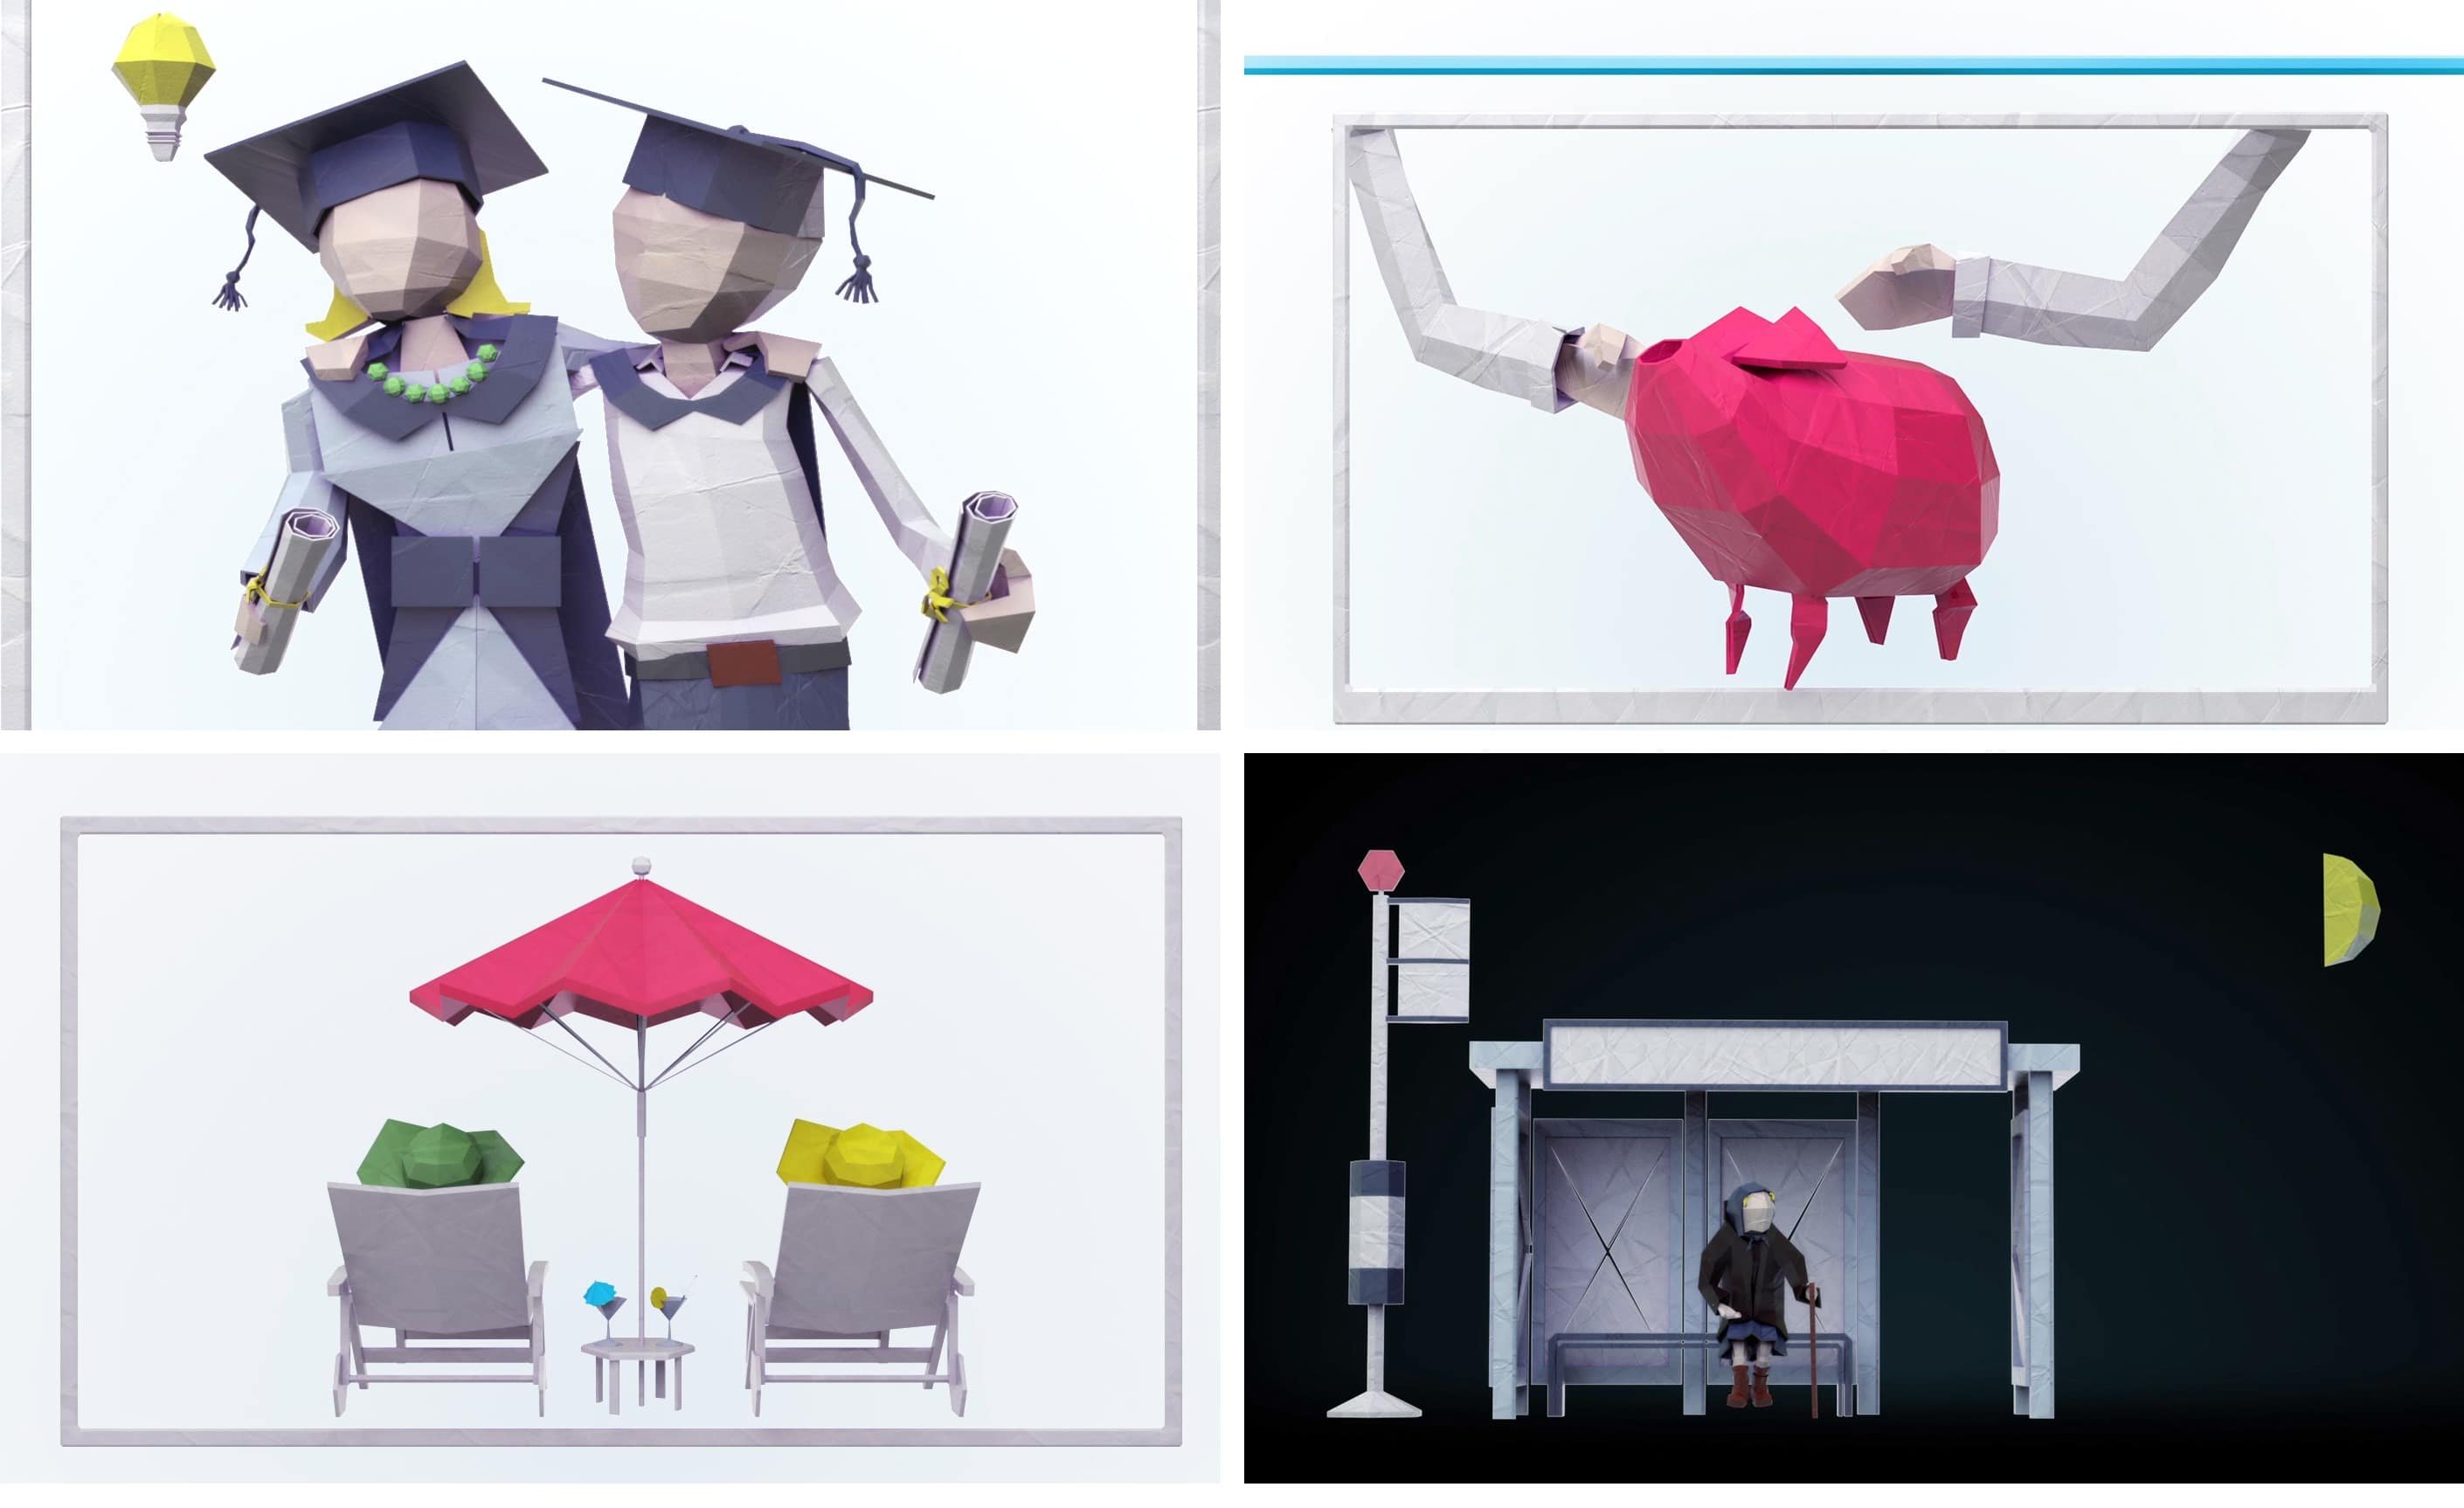 stas3dart-portus-consulting-pensions-animation